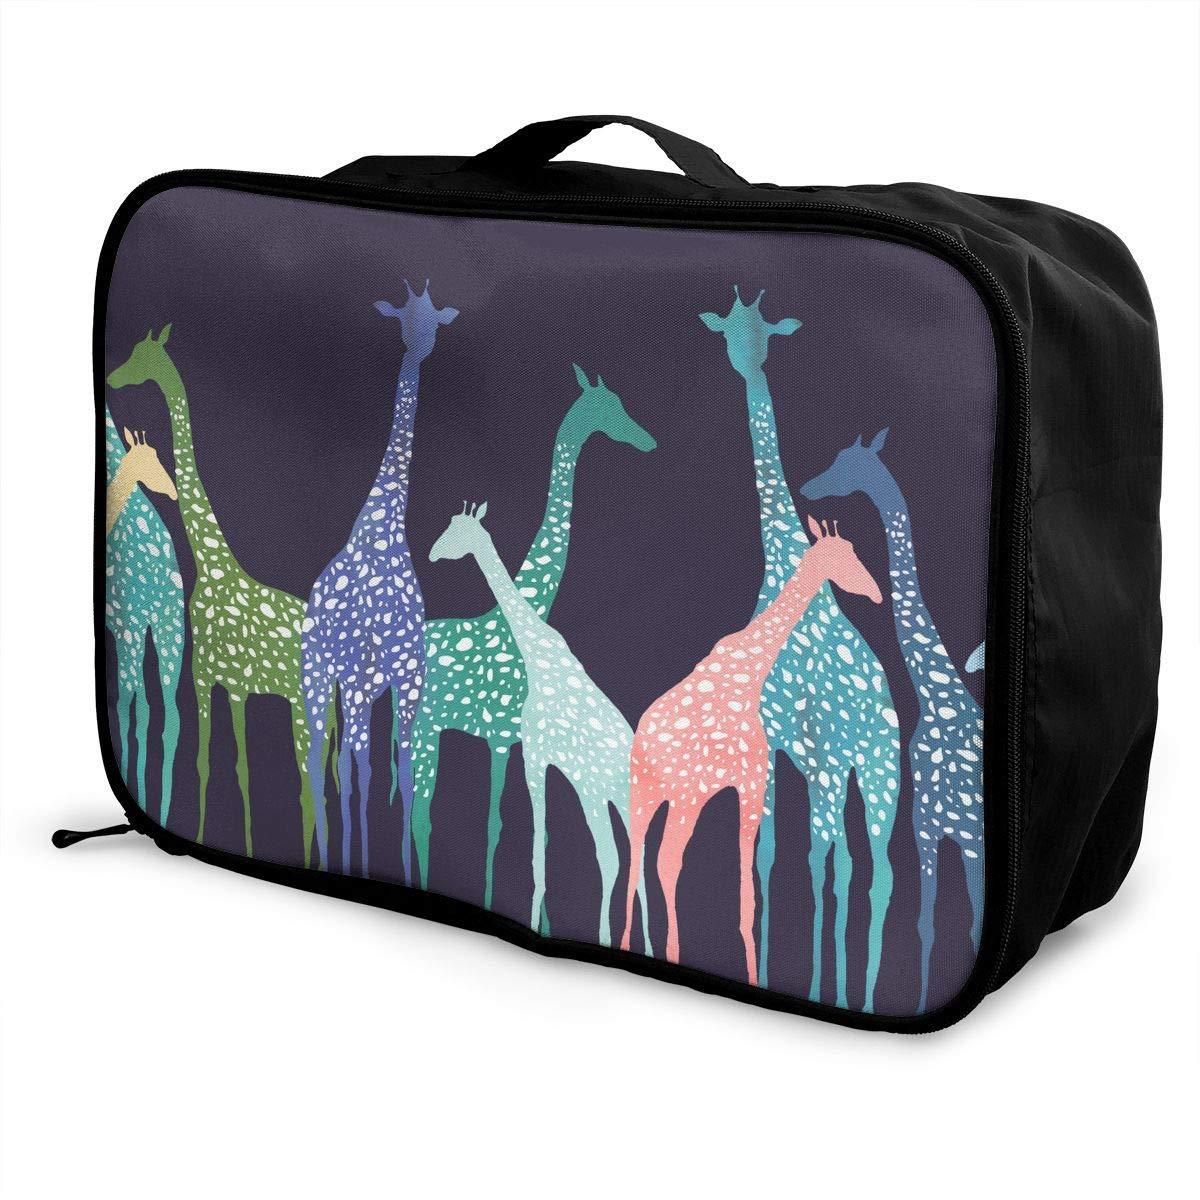 Lightweight Large Capacity Portable Duffel Bag for Men /& Women Color Giraffe Travel Duffel Bag Backpack JTRVW Luggage Bags for Travel